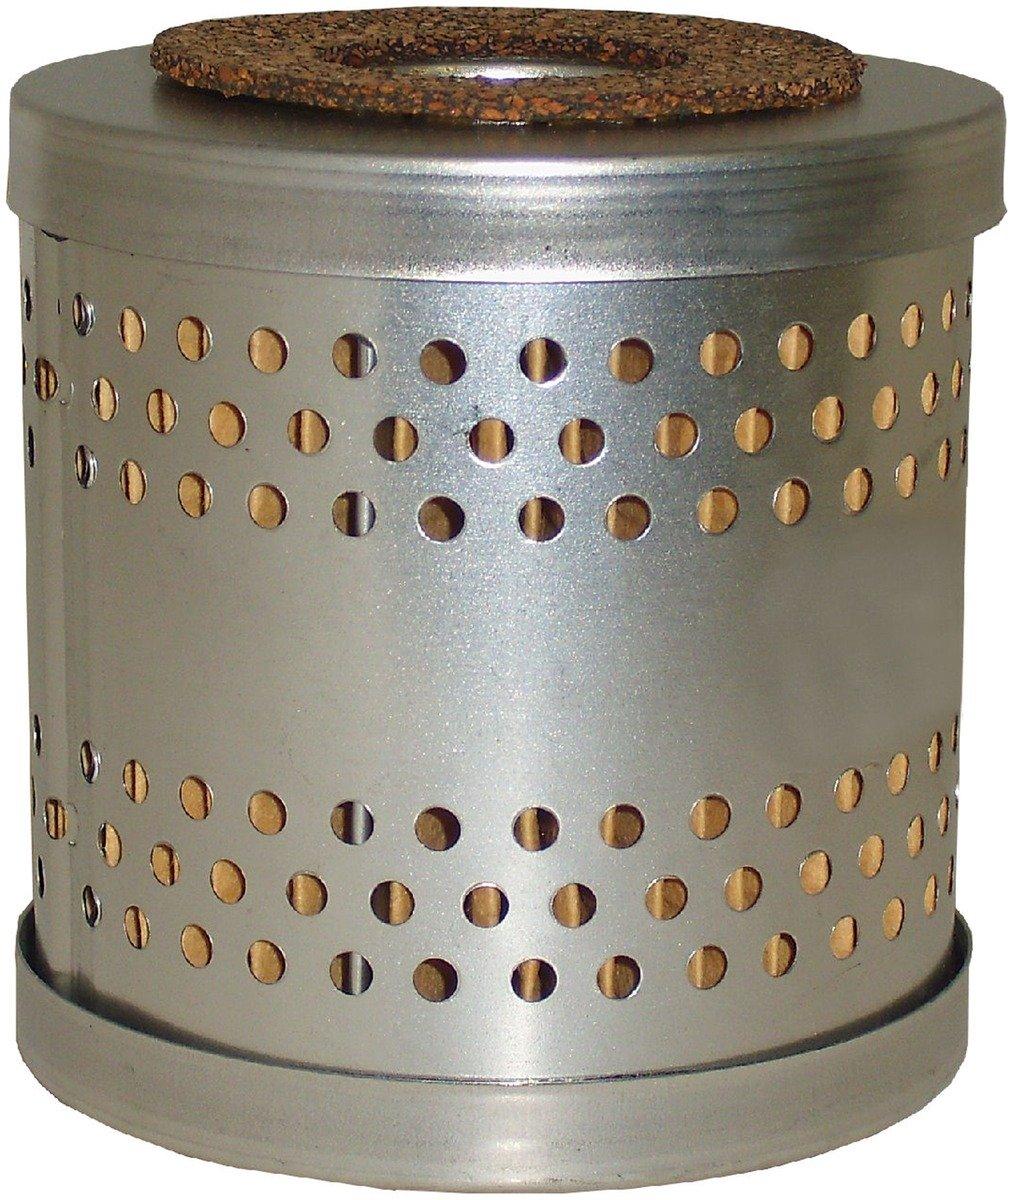 Luber-finer L23F Heavy Duty Fuel Filter